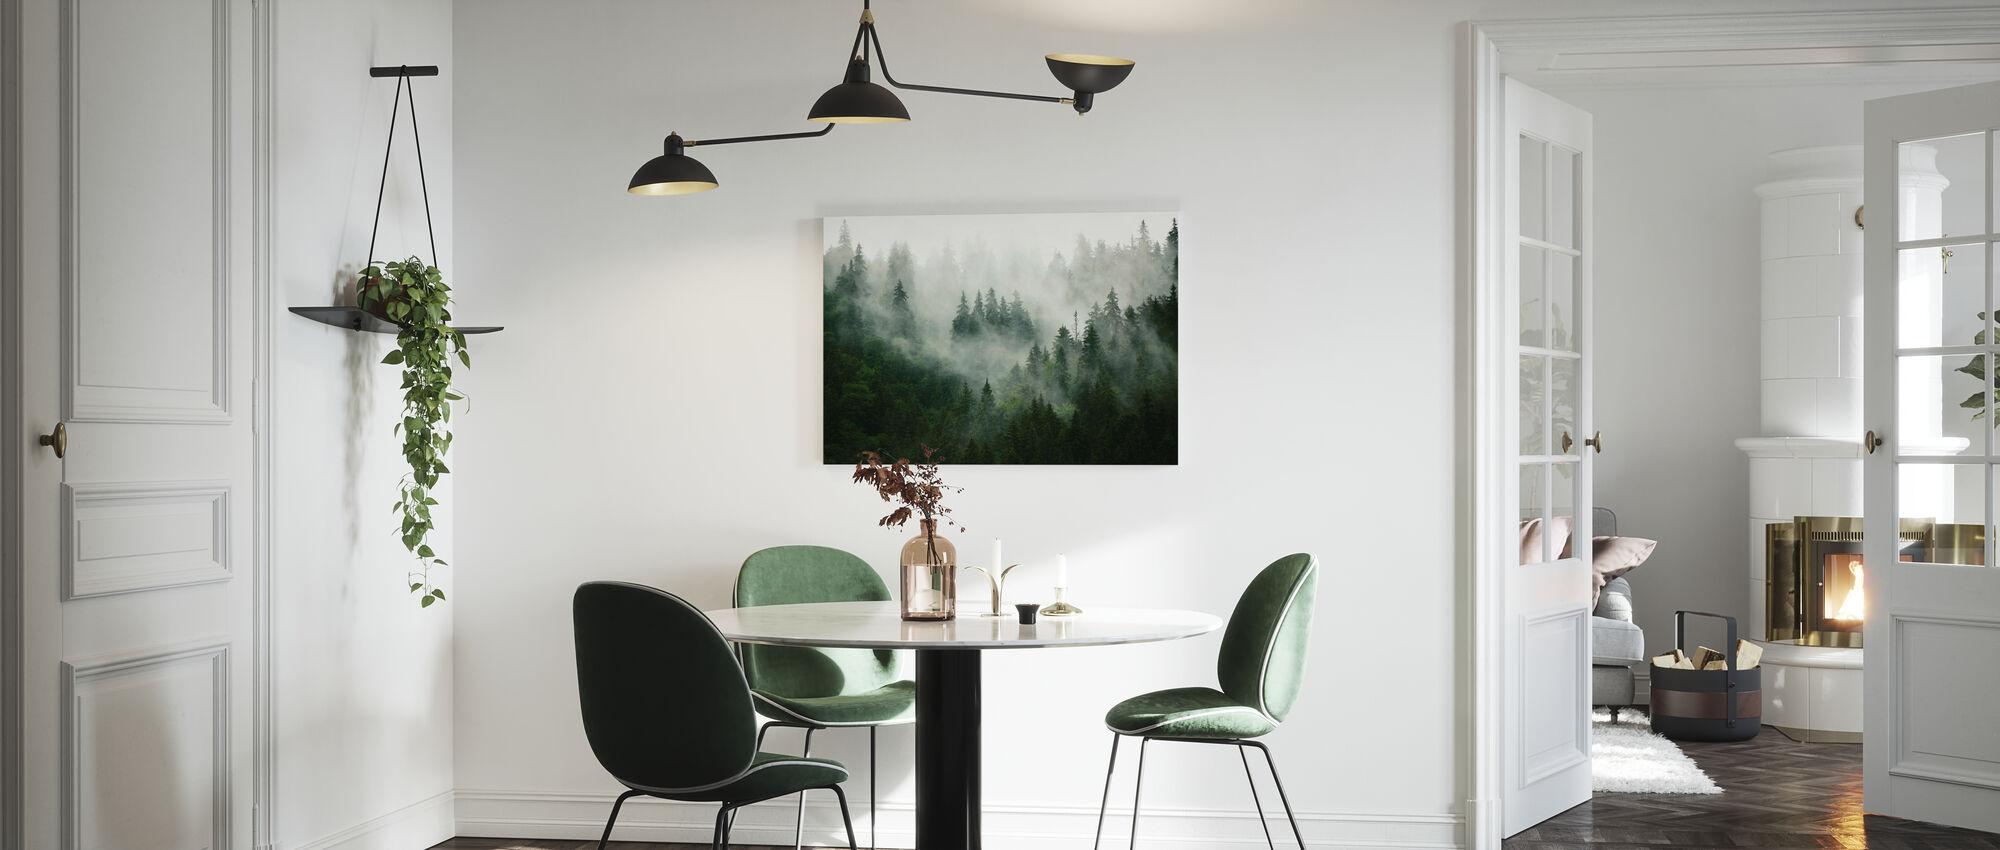 Foresta nebbiosa - Stampa su tela - Cucina